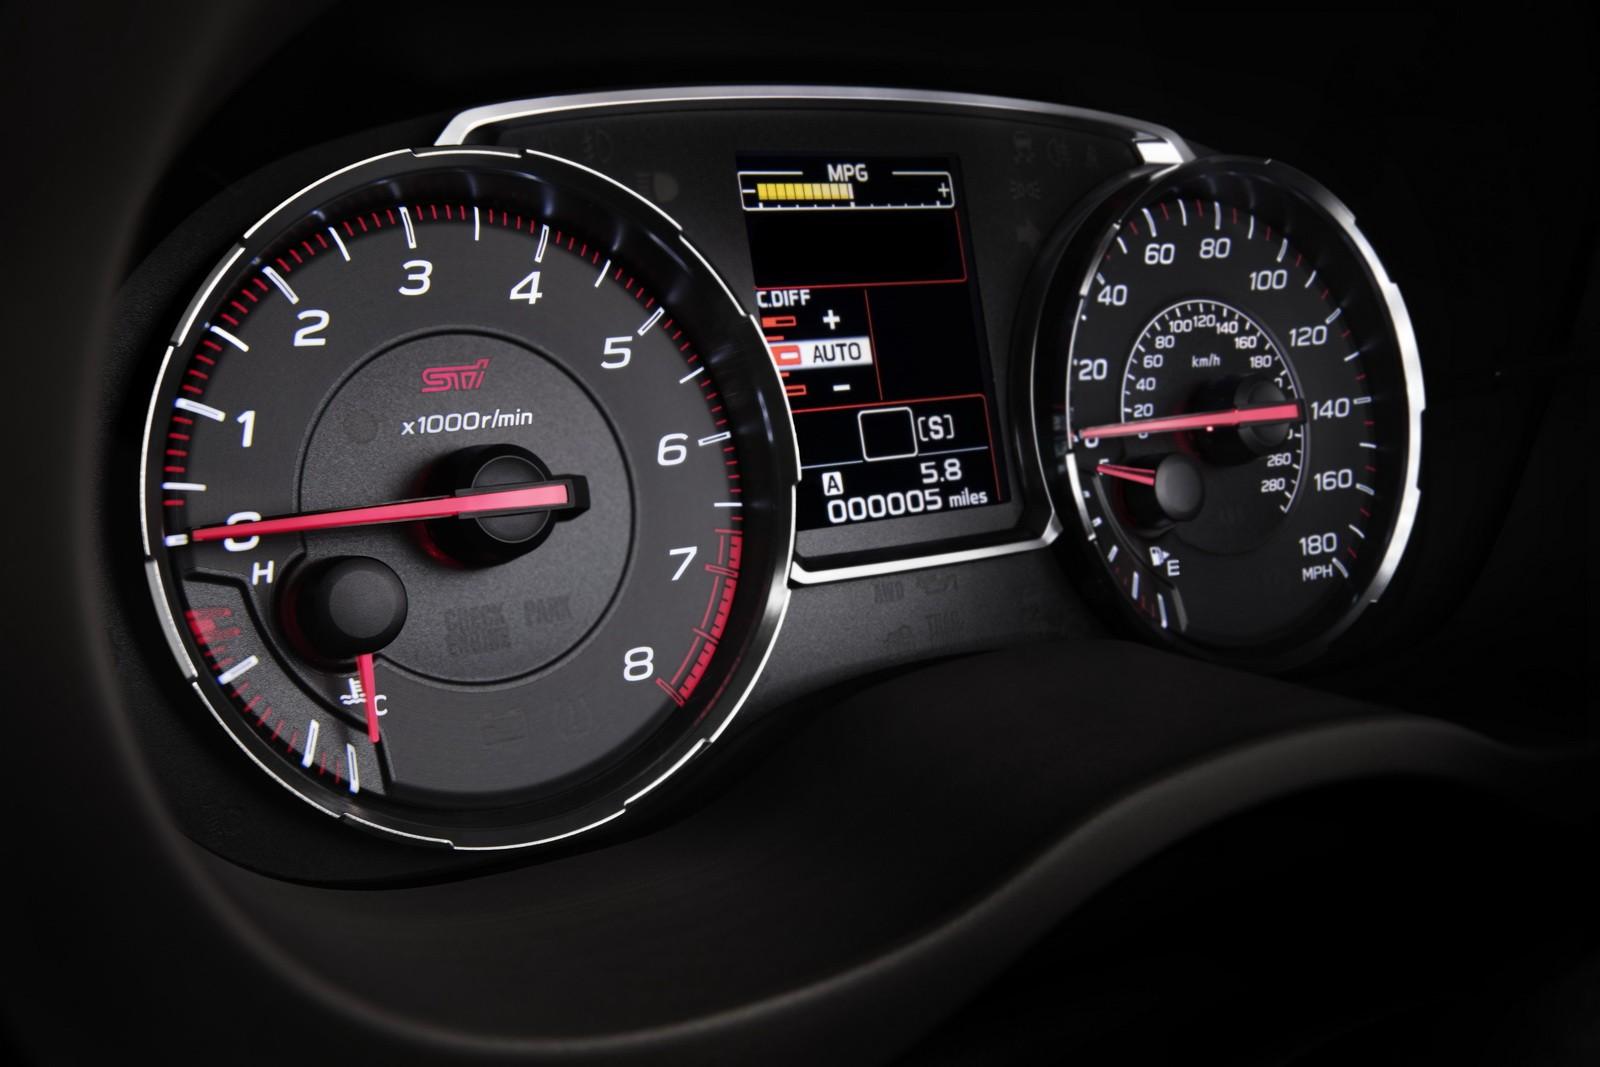 2018 Subaru Impreza Wrx Sti Rendered As A Hatchback